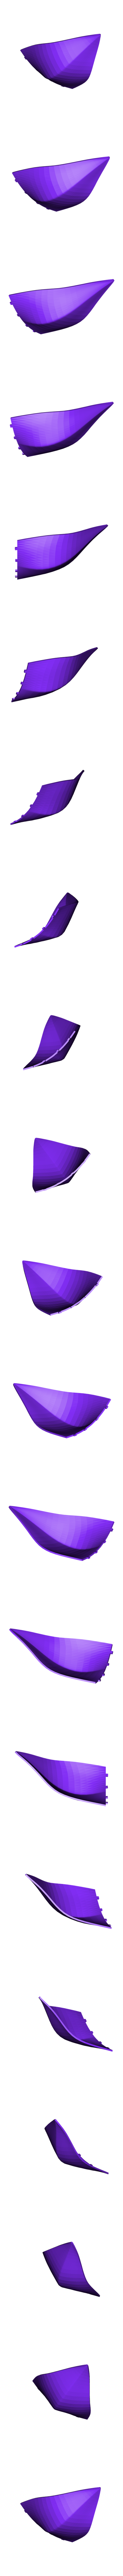 "lotuslamp_small_leaf.STL Download free STL file Lotus ceiling lamp based on cheap IKEA Lamp mount ""Lock"" • 3D print design, Pratrik"